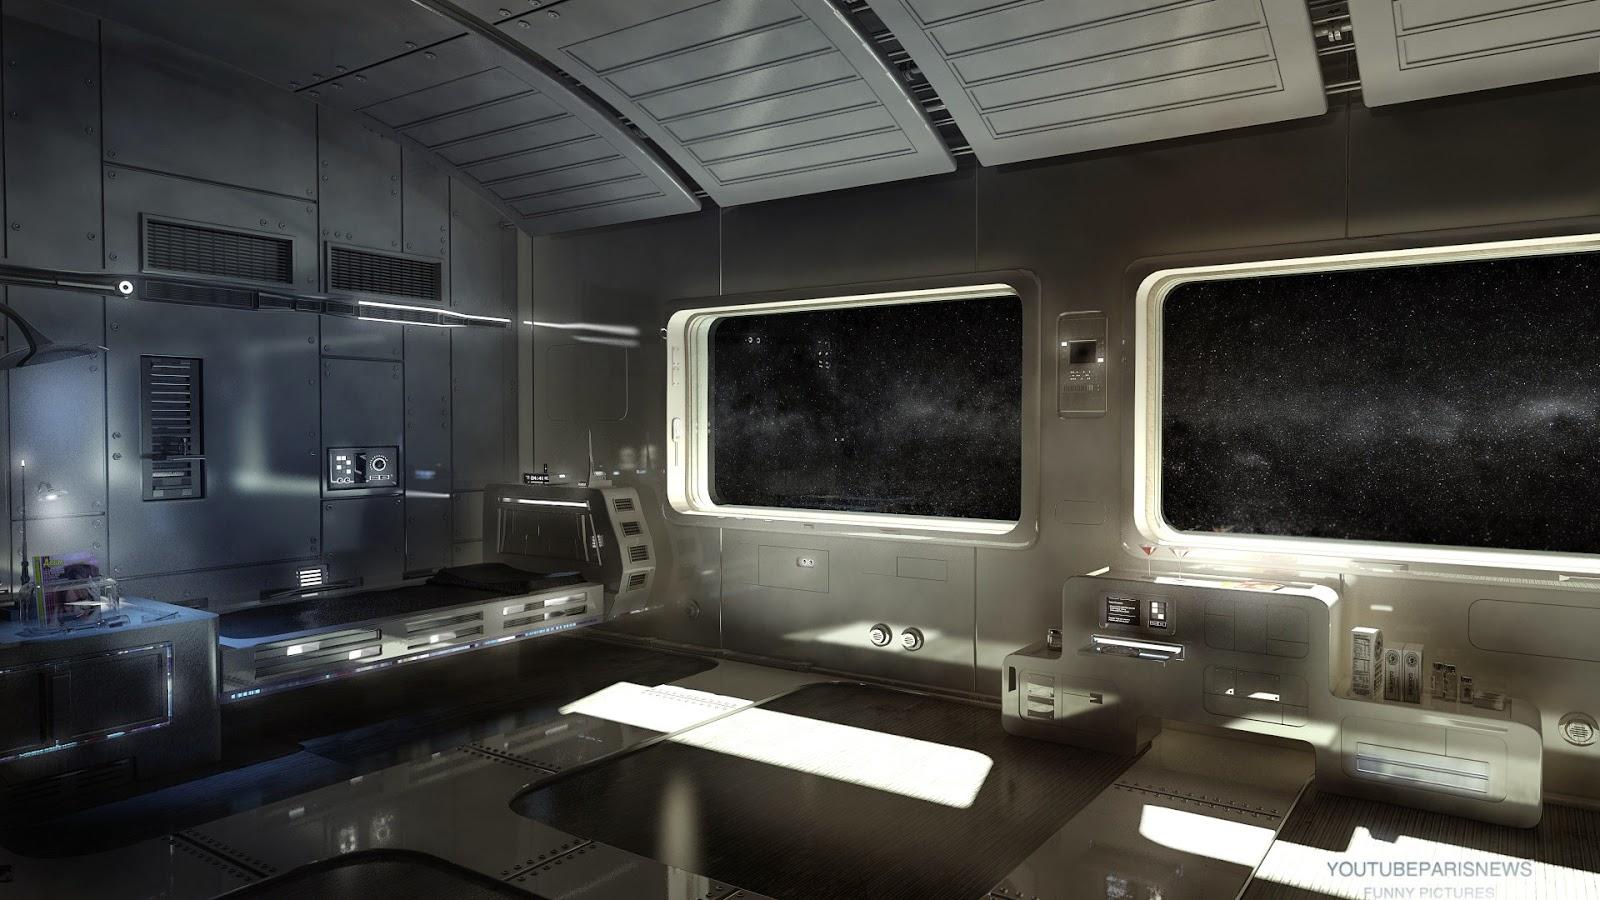 Space_Cabin-s1920x1080-360657.jpg